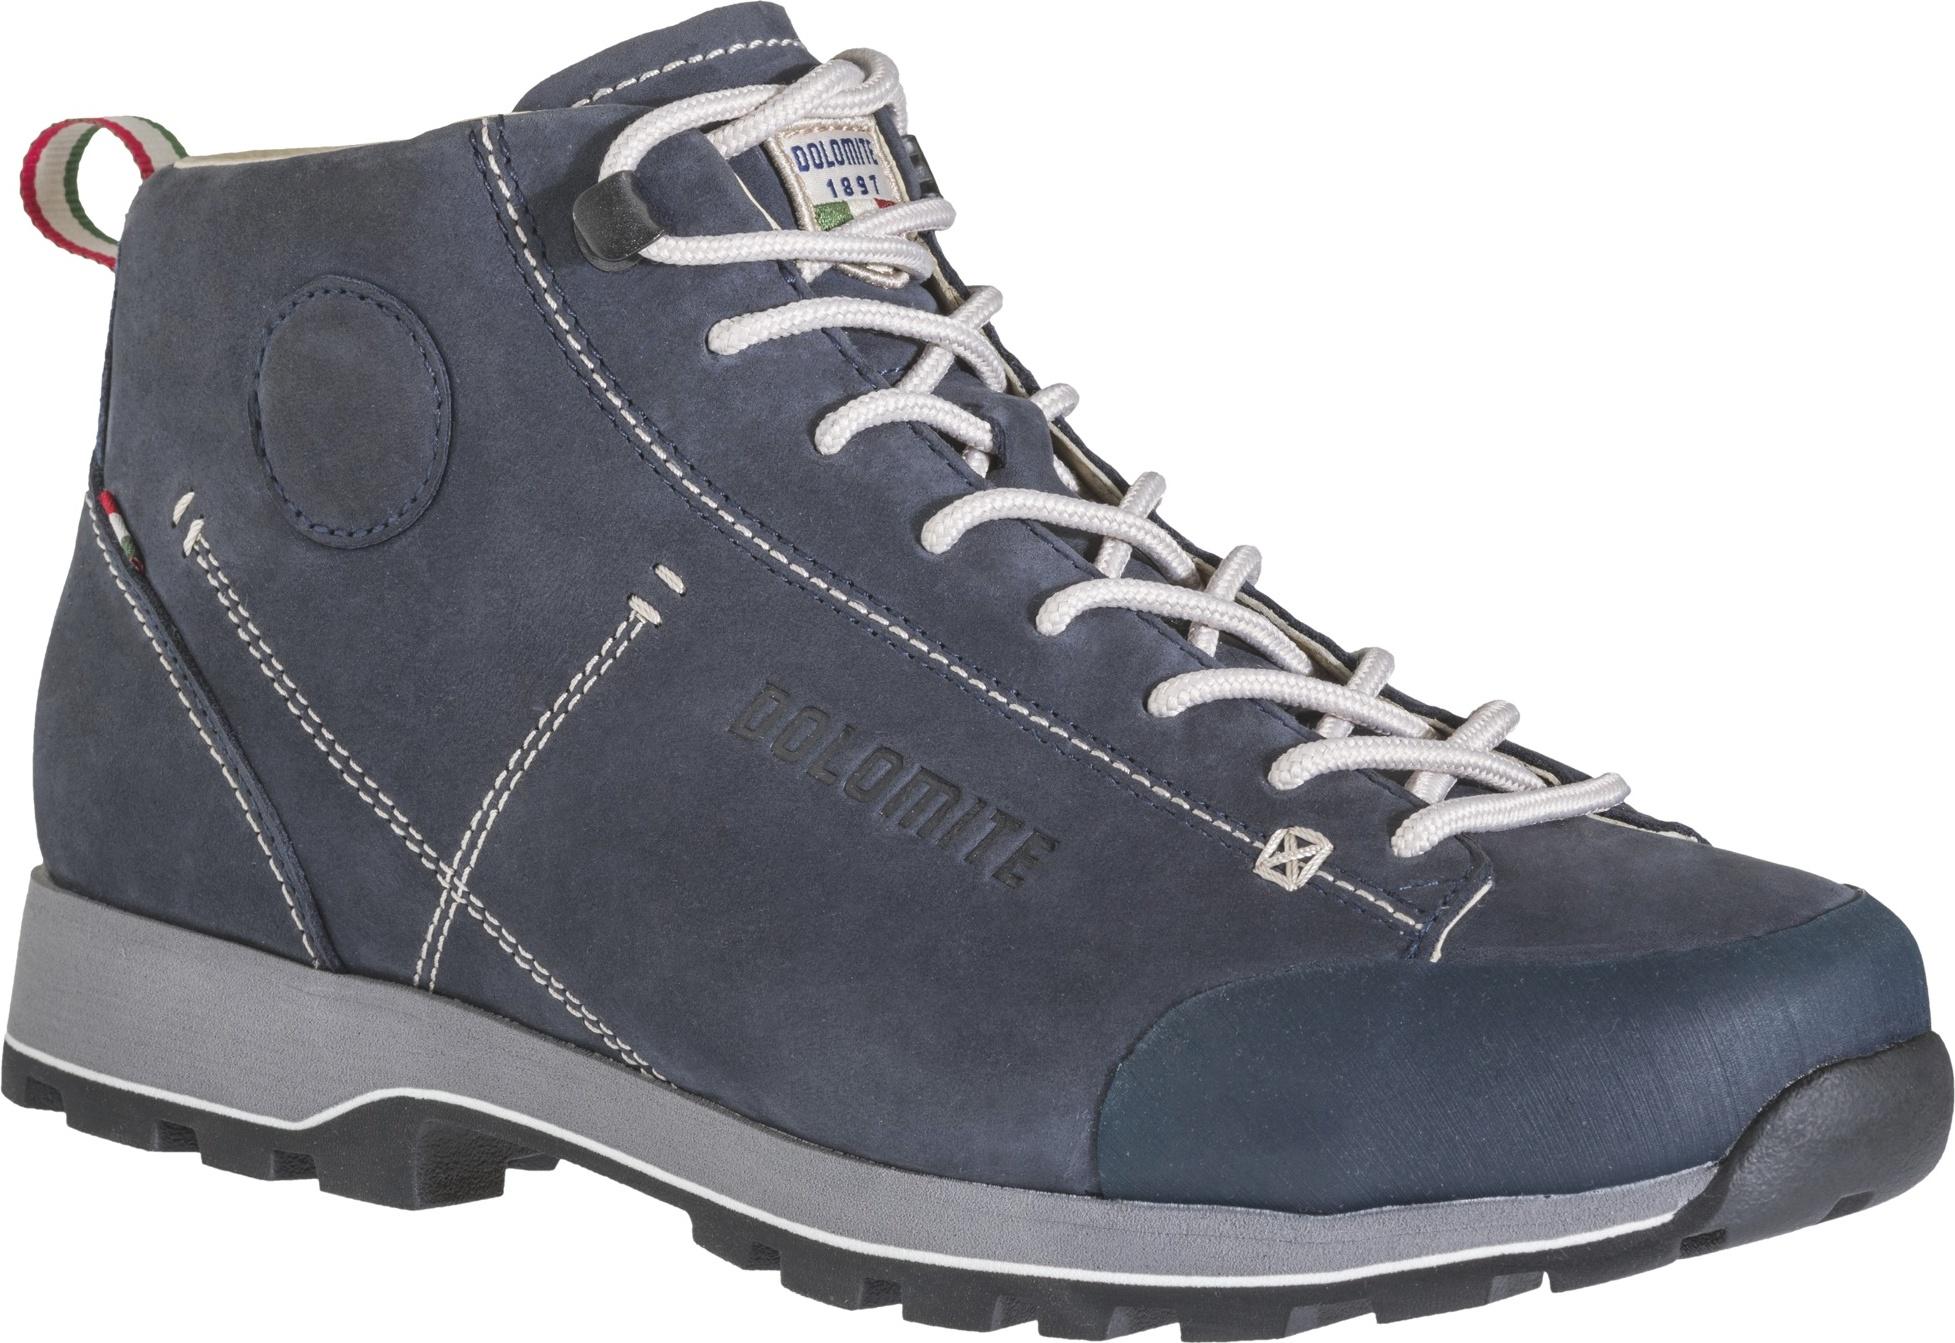 Ботинки Dolomite 54 Mid Fg, blue navy, 9.5 UK